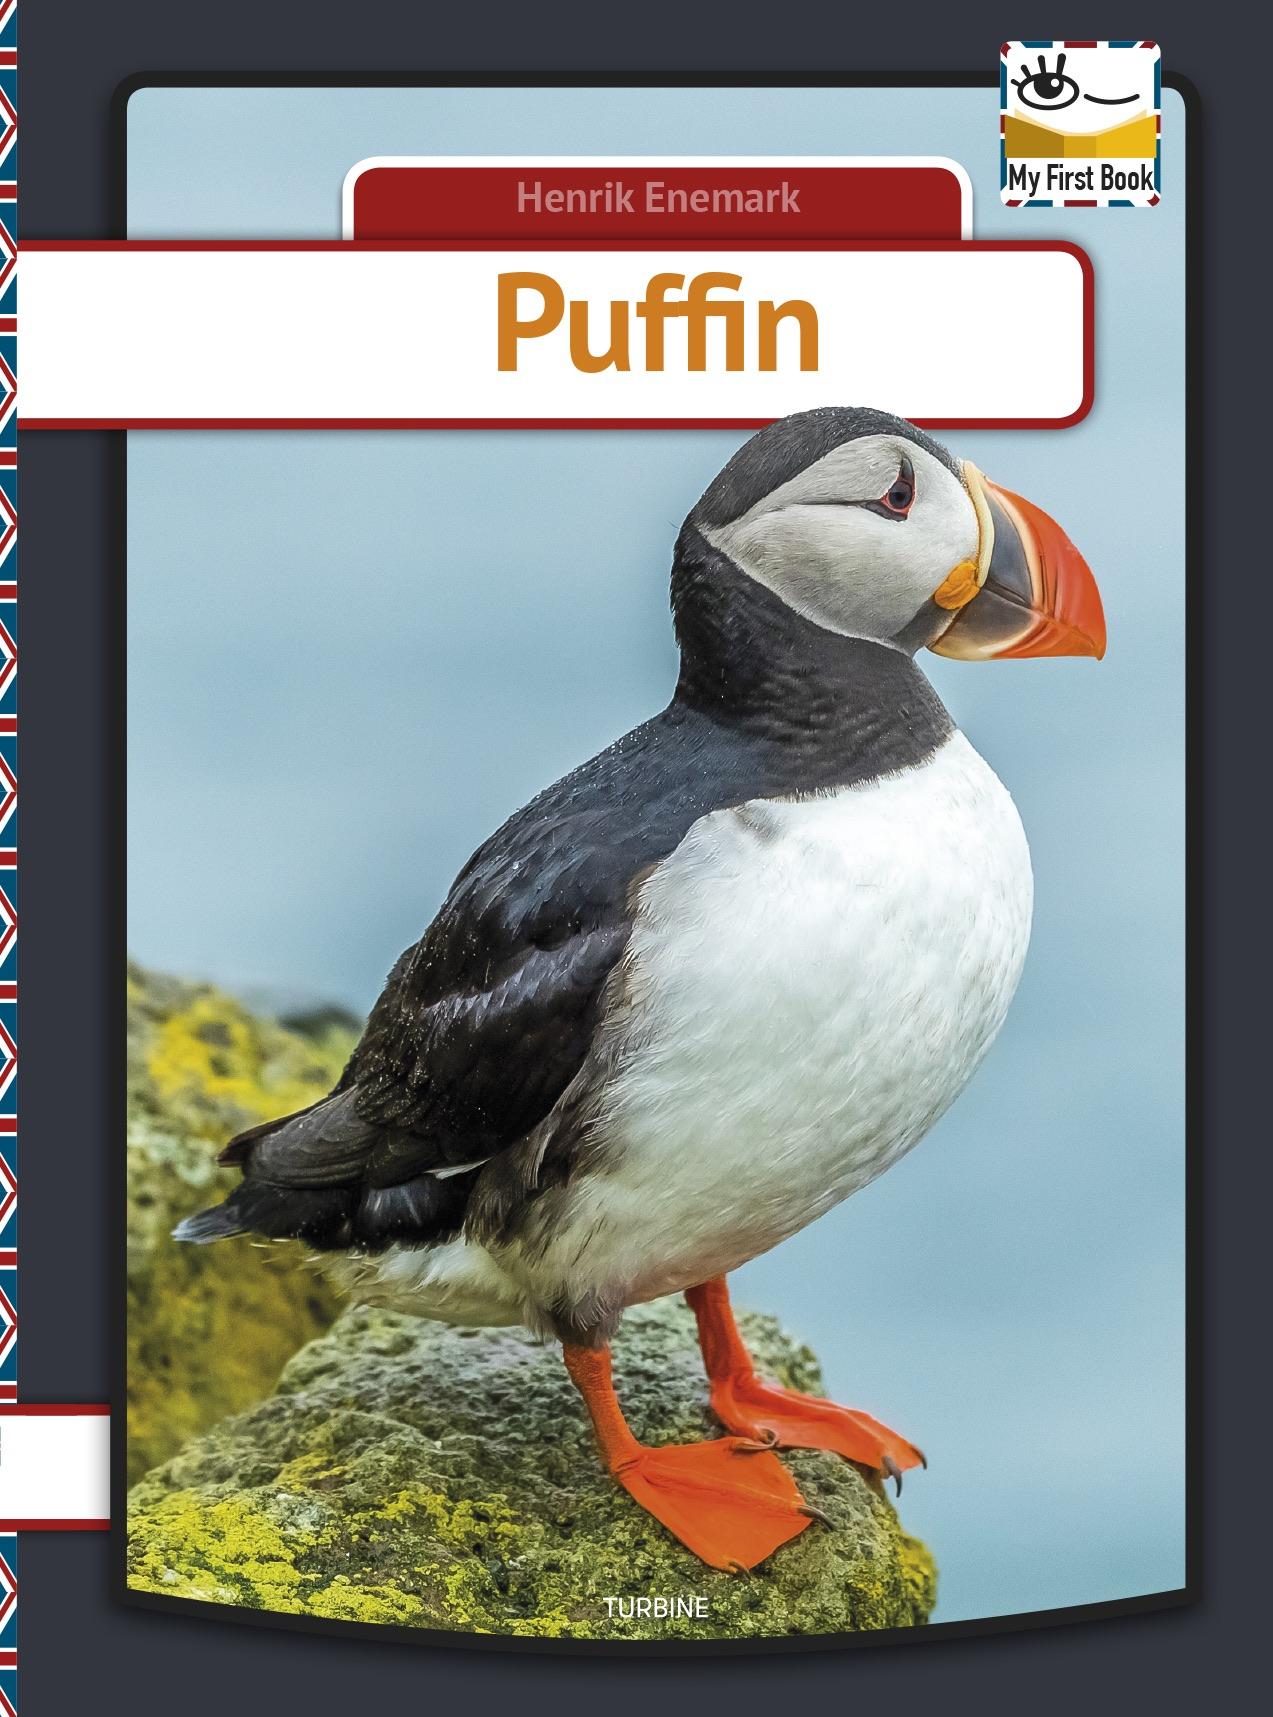 My first book: Puffin - Henrik Enemark - Bøger - Turbine - 9788740659122 - 25/9-2019